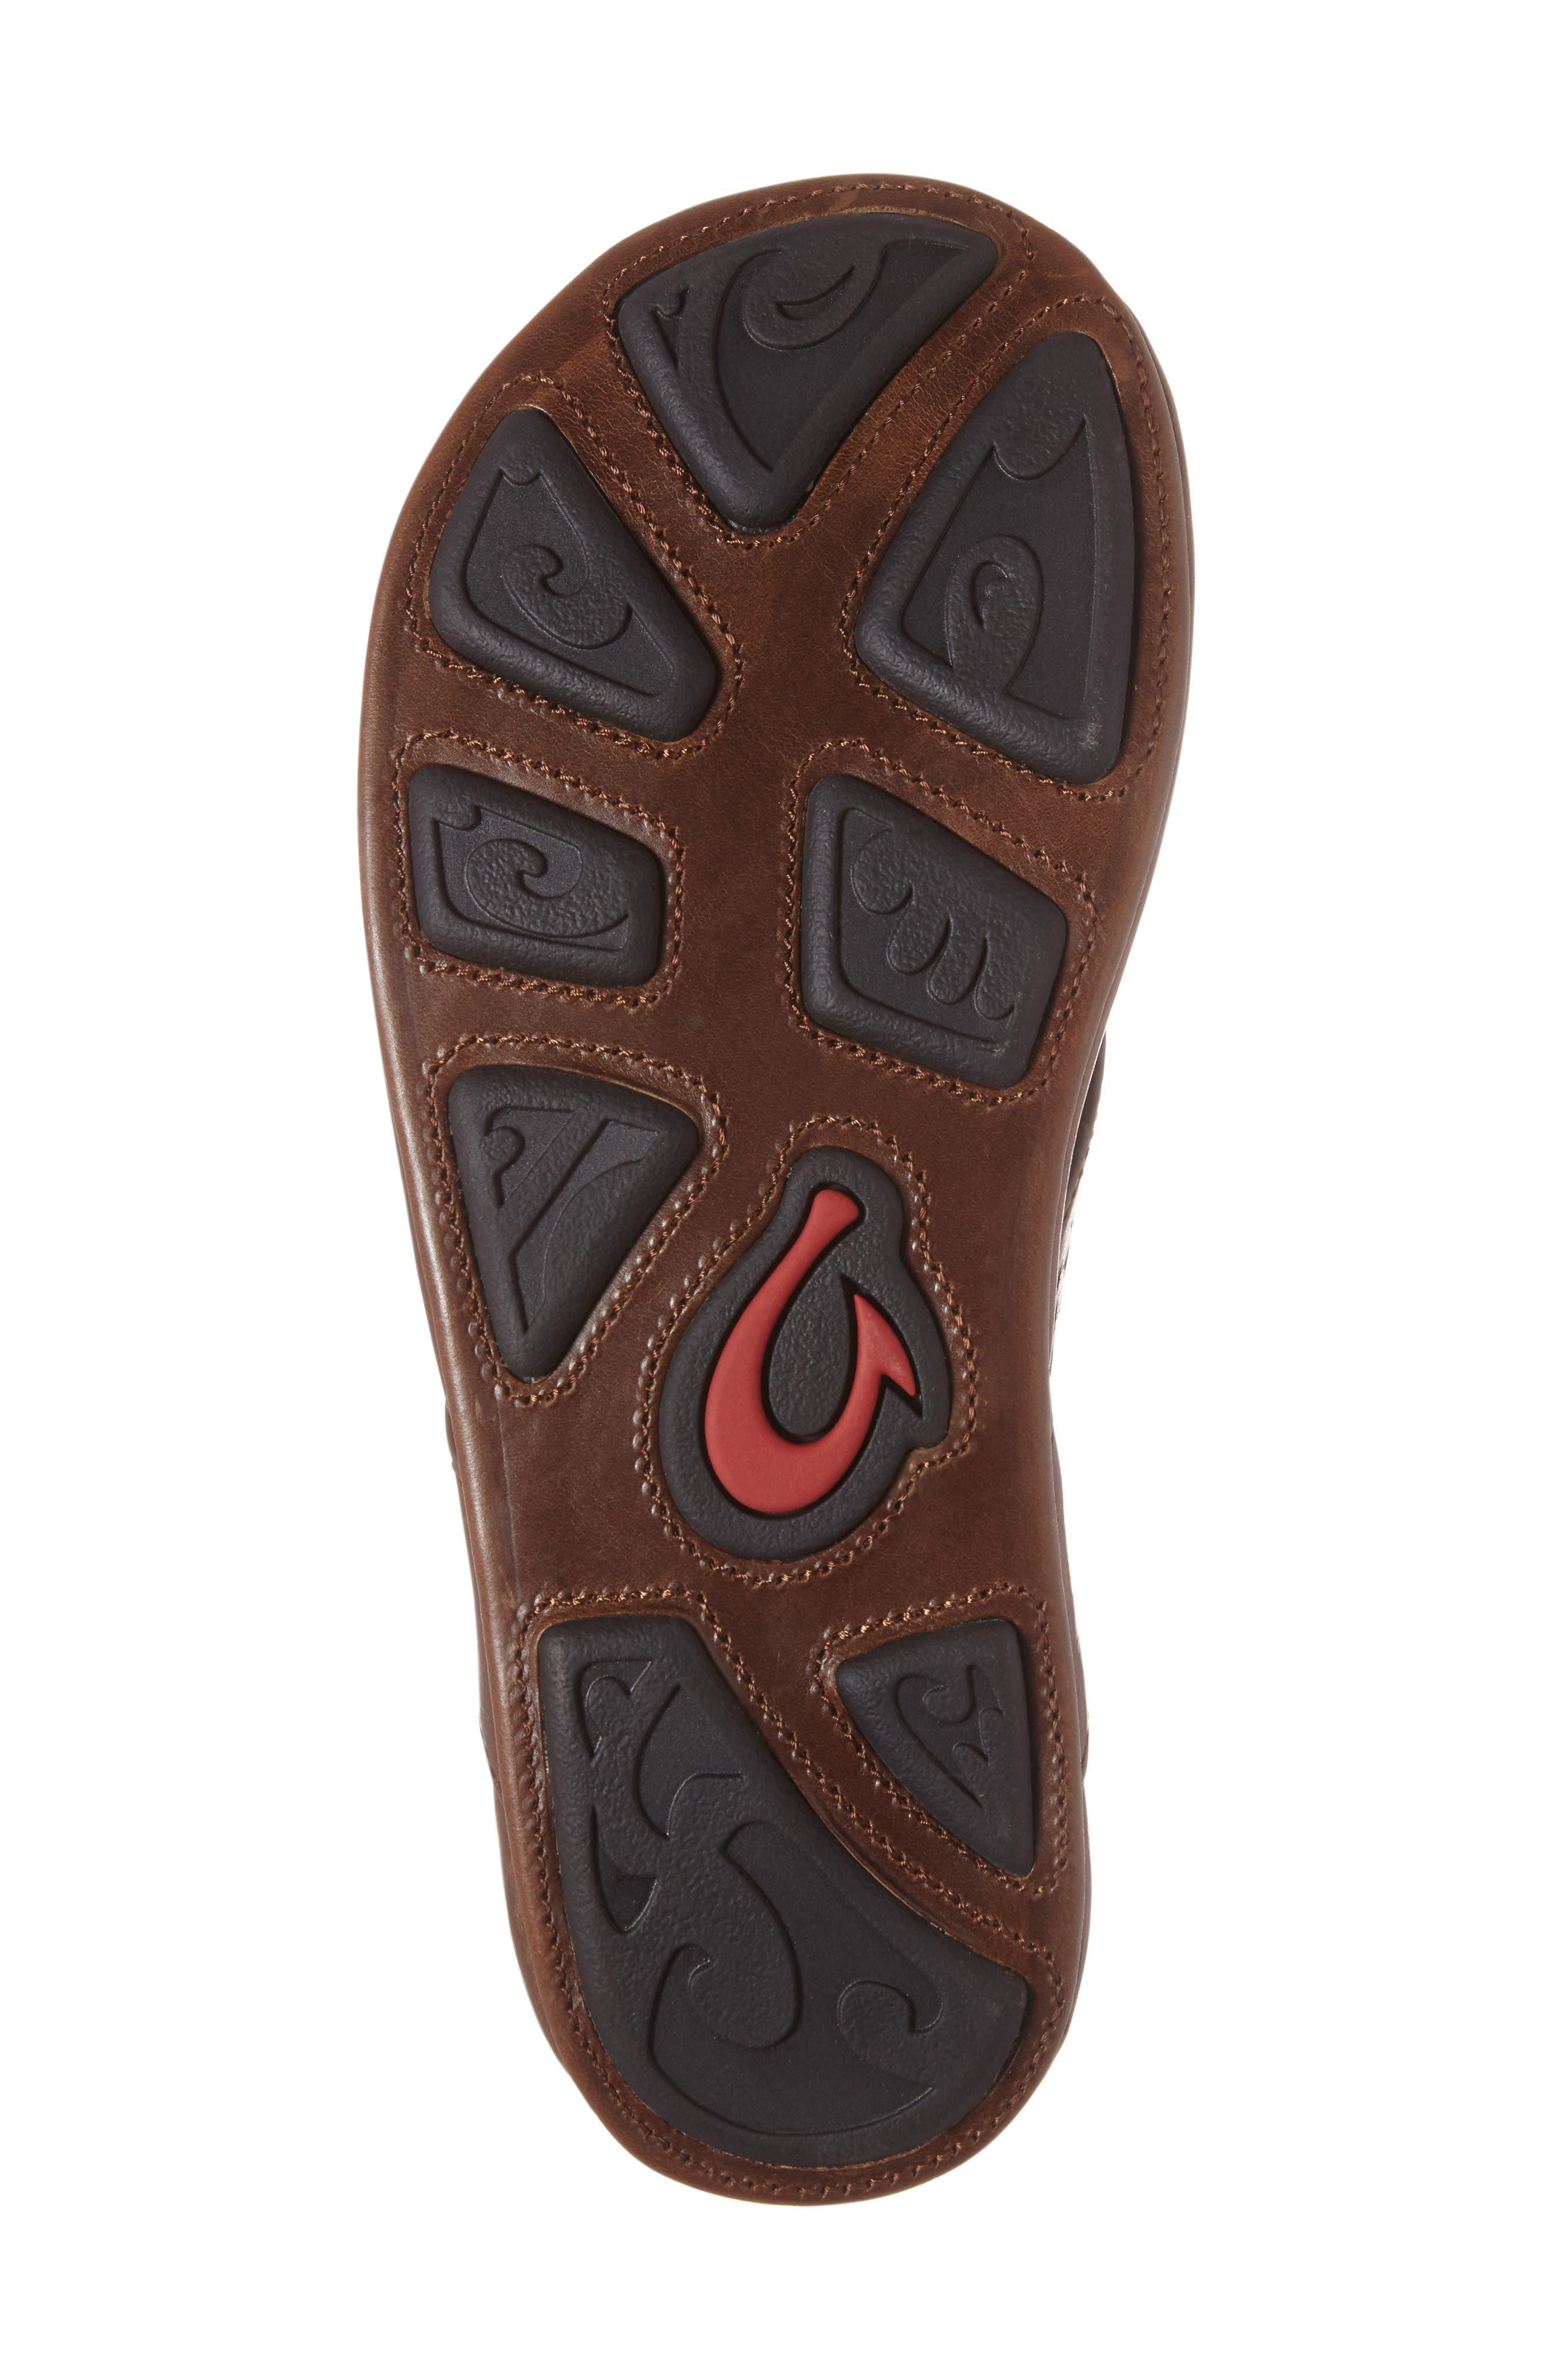 Kohana Flip Flop,                             Alternate thumbnail 4, color,                             Toffee/ Toffee Leather